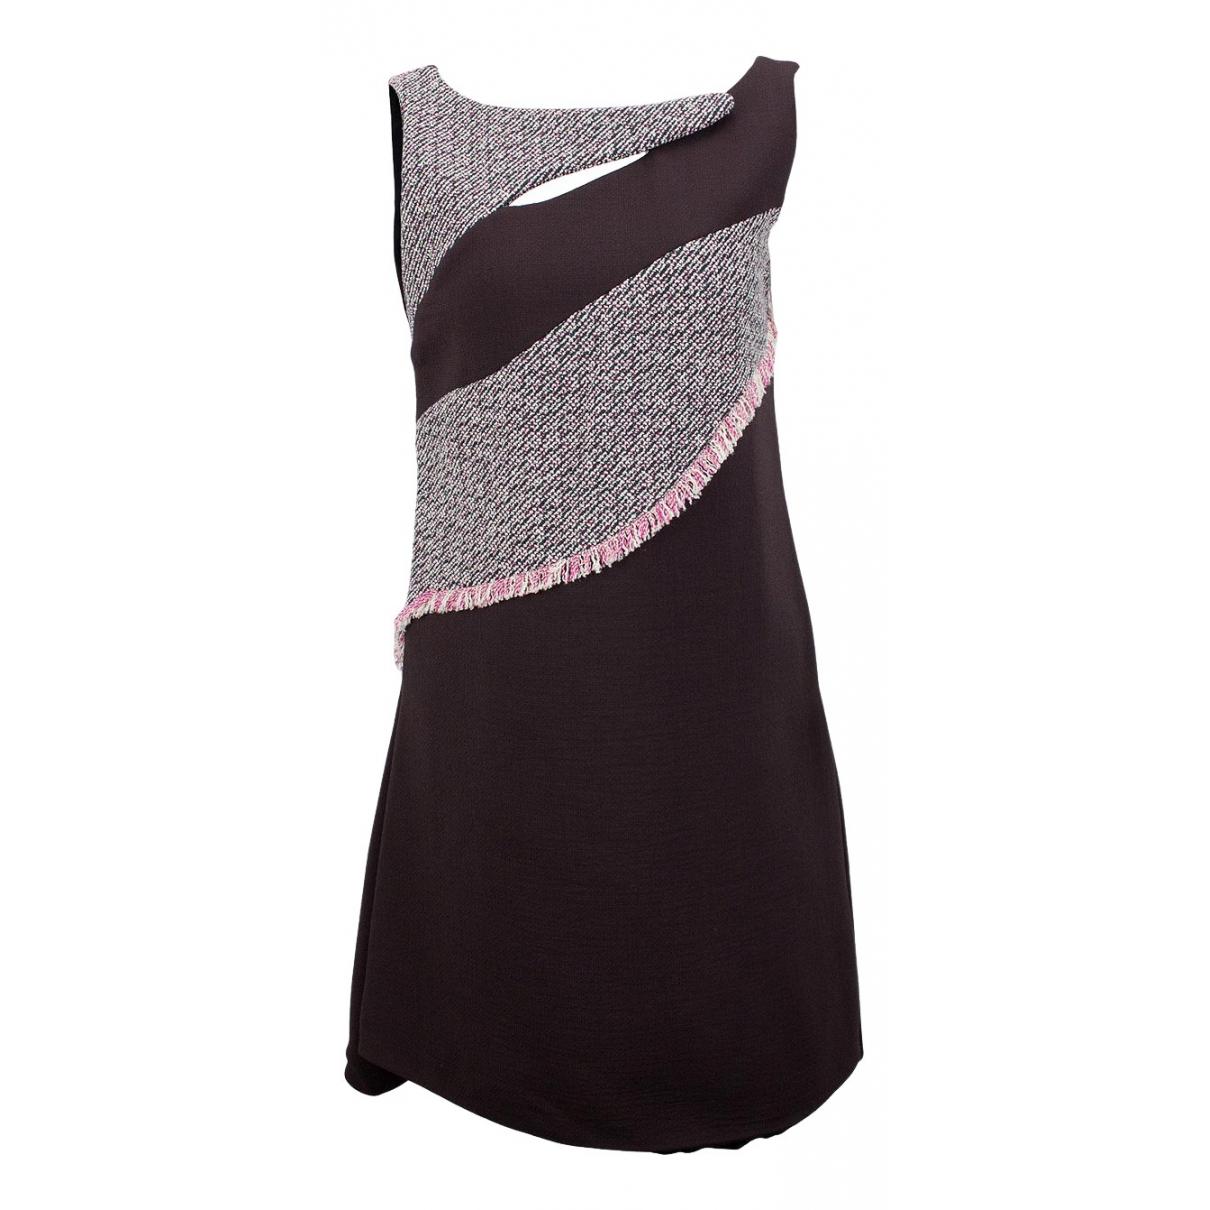 Christian Dior \N Kleid in  Braun Wolle